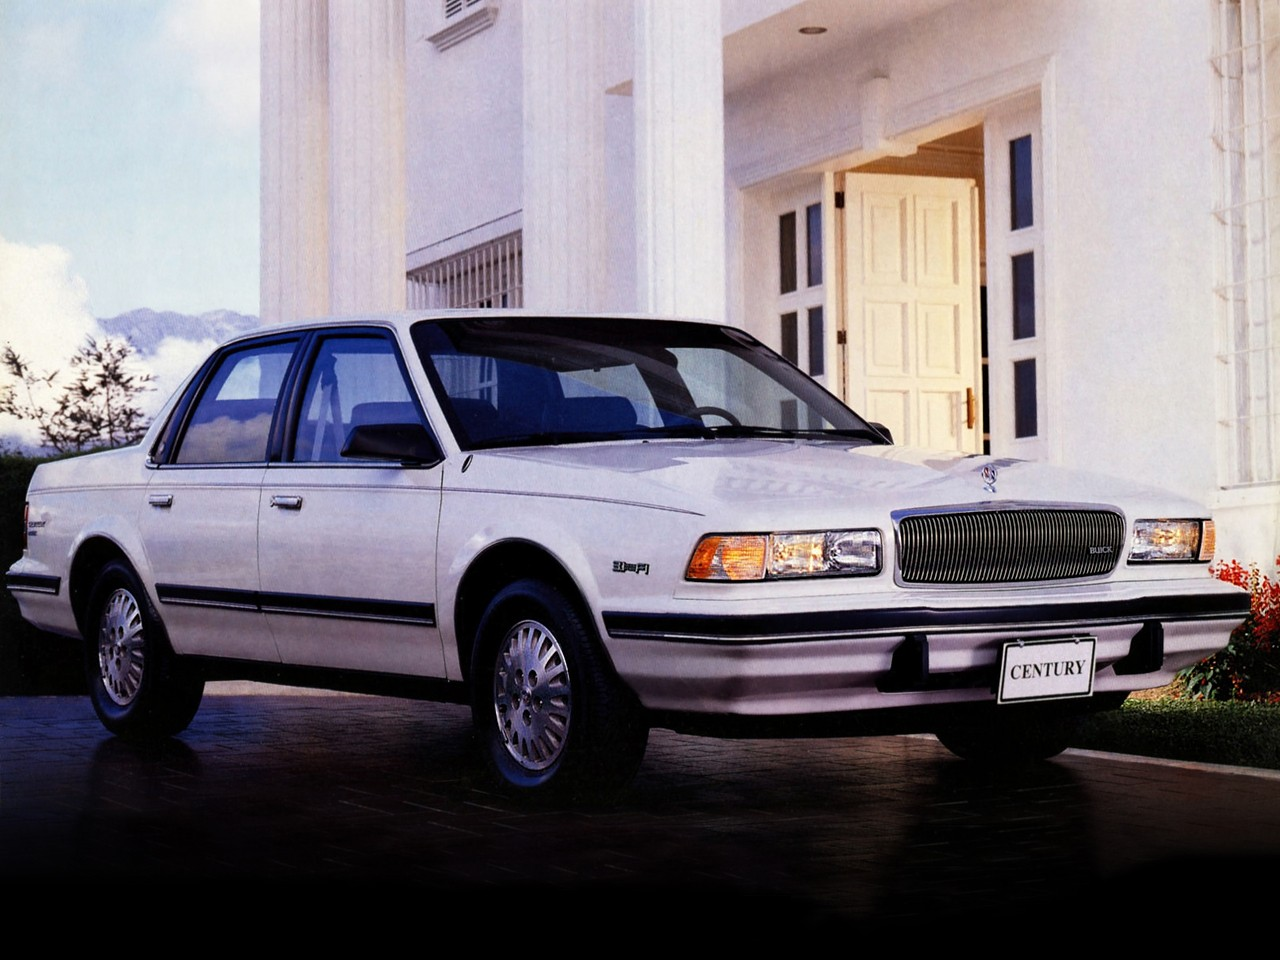 Buick Century Specs Photos 1989 1990 1991 1992 1993 1994 3100 Sfi V6 Engine Diagram Car Tuning 1996